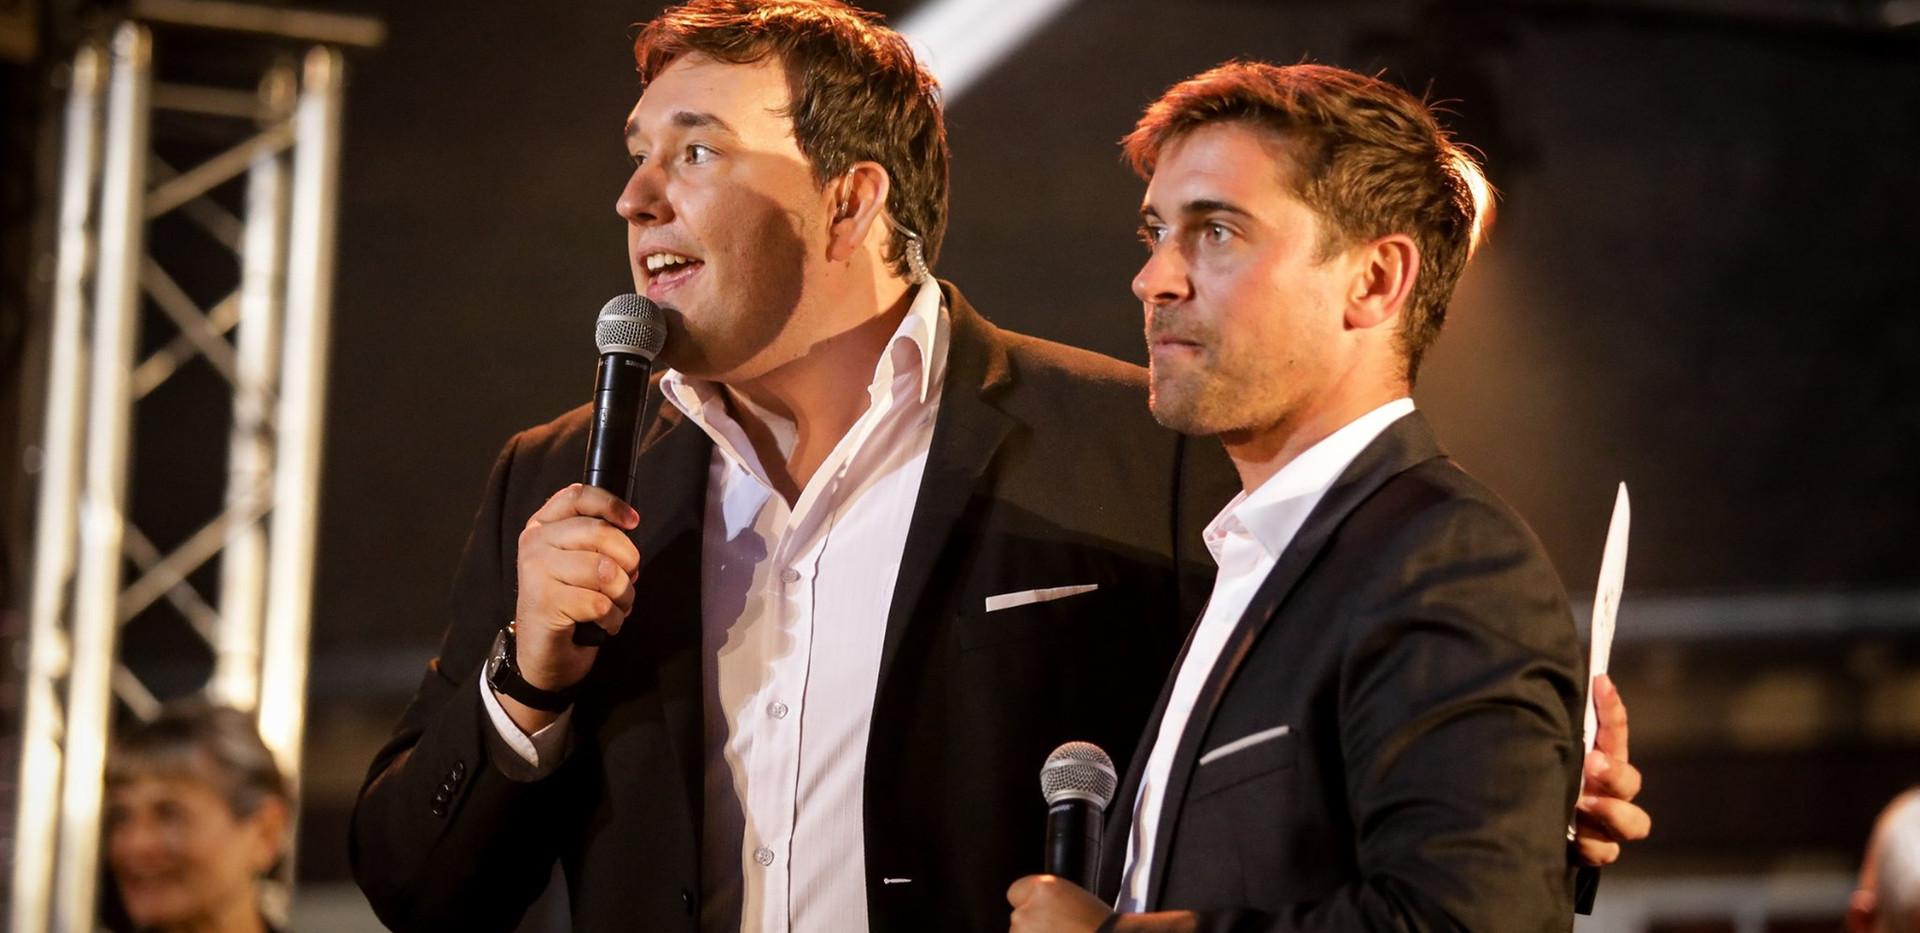 Maxime Schneider et Edouard Grégoire